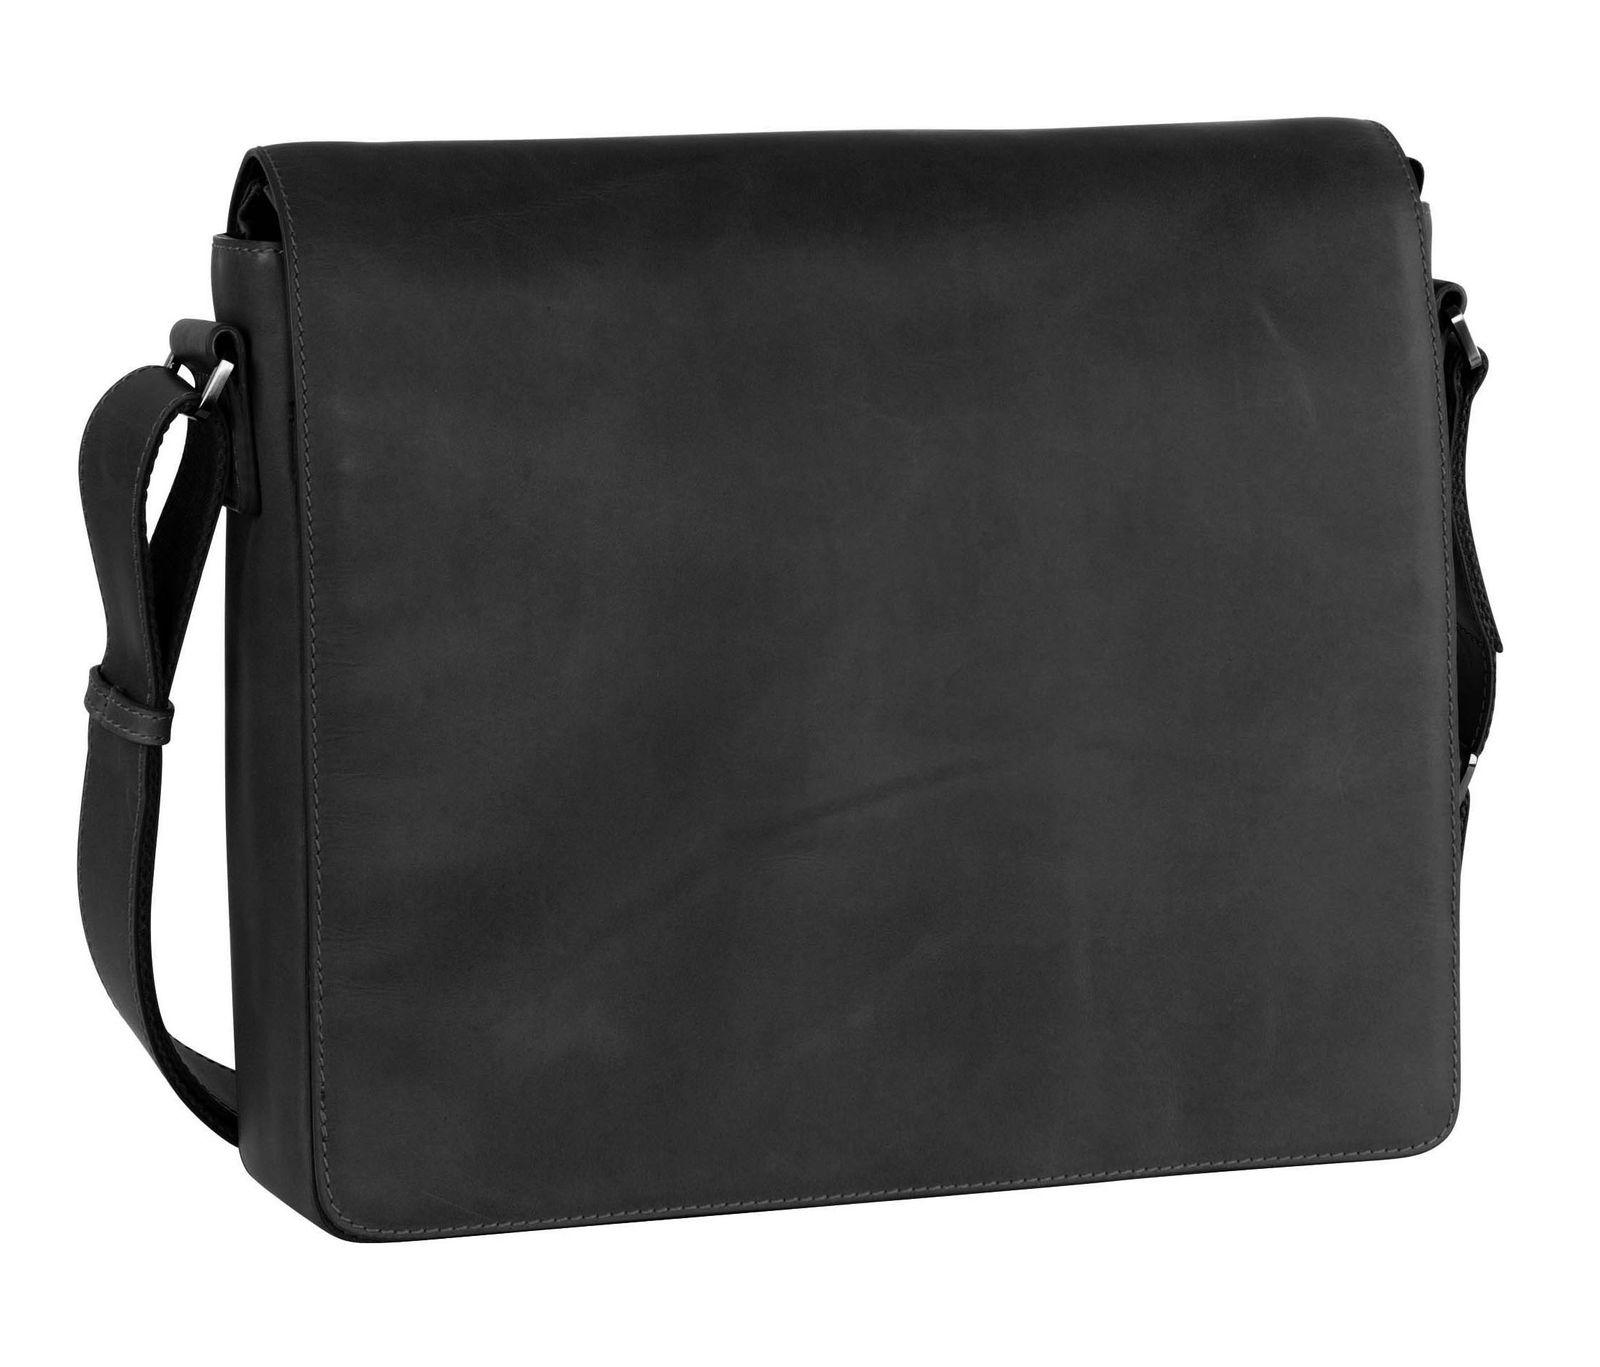 LEONHARD HEYDEN Ottawa Crossbody Bag M Black